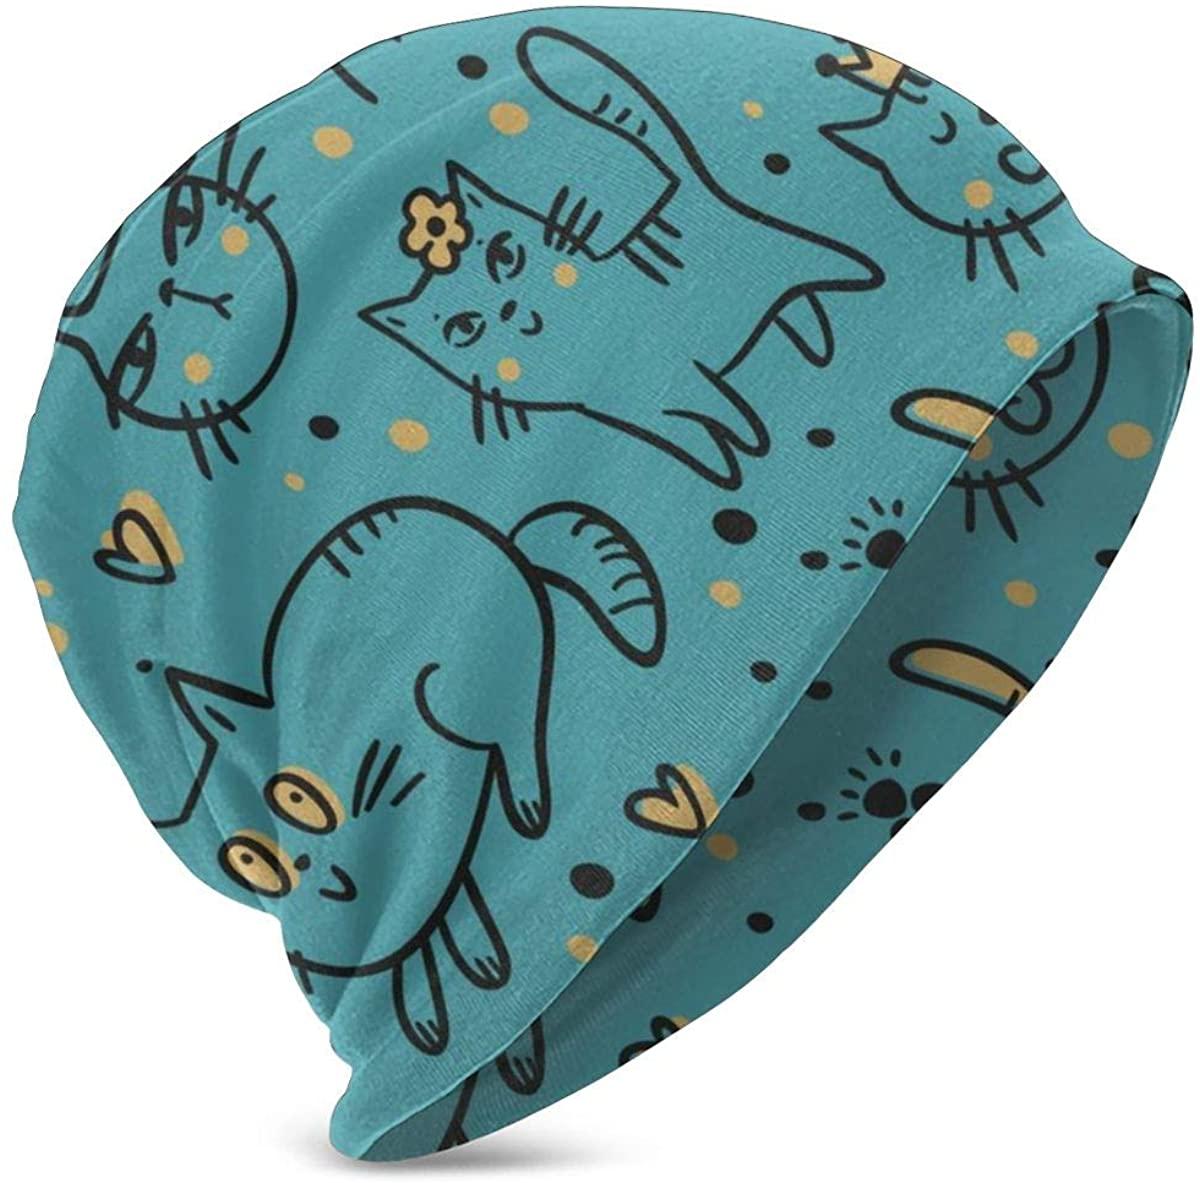 PETER HONG Teen Girls Boys Beanie Hat, Cuff Cap, Skull Hat, Dome Cap Daily Hat(Cute Leisurely Cats Kitten )